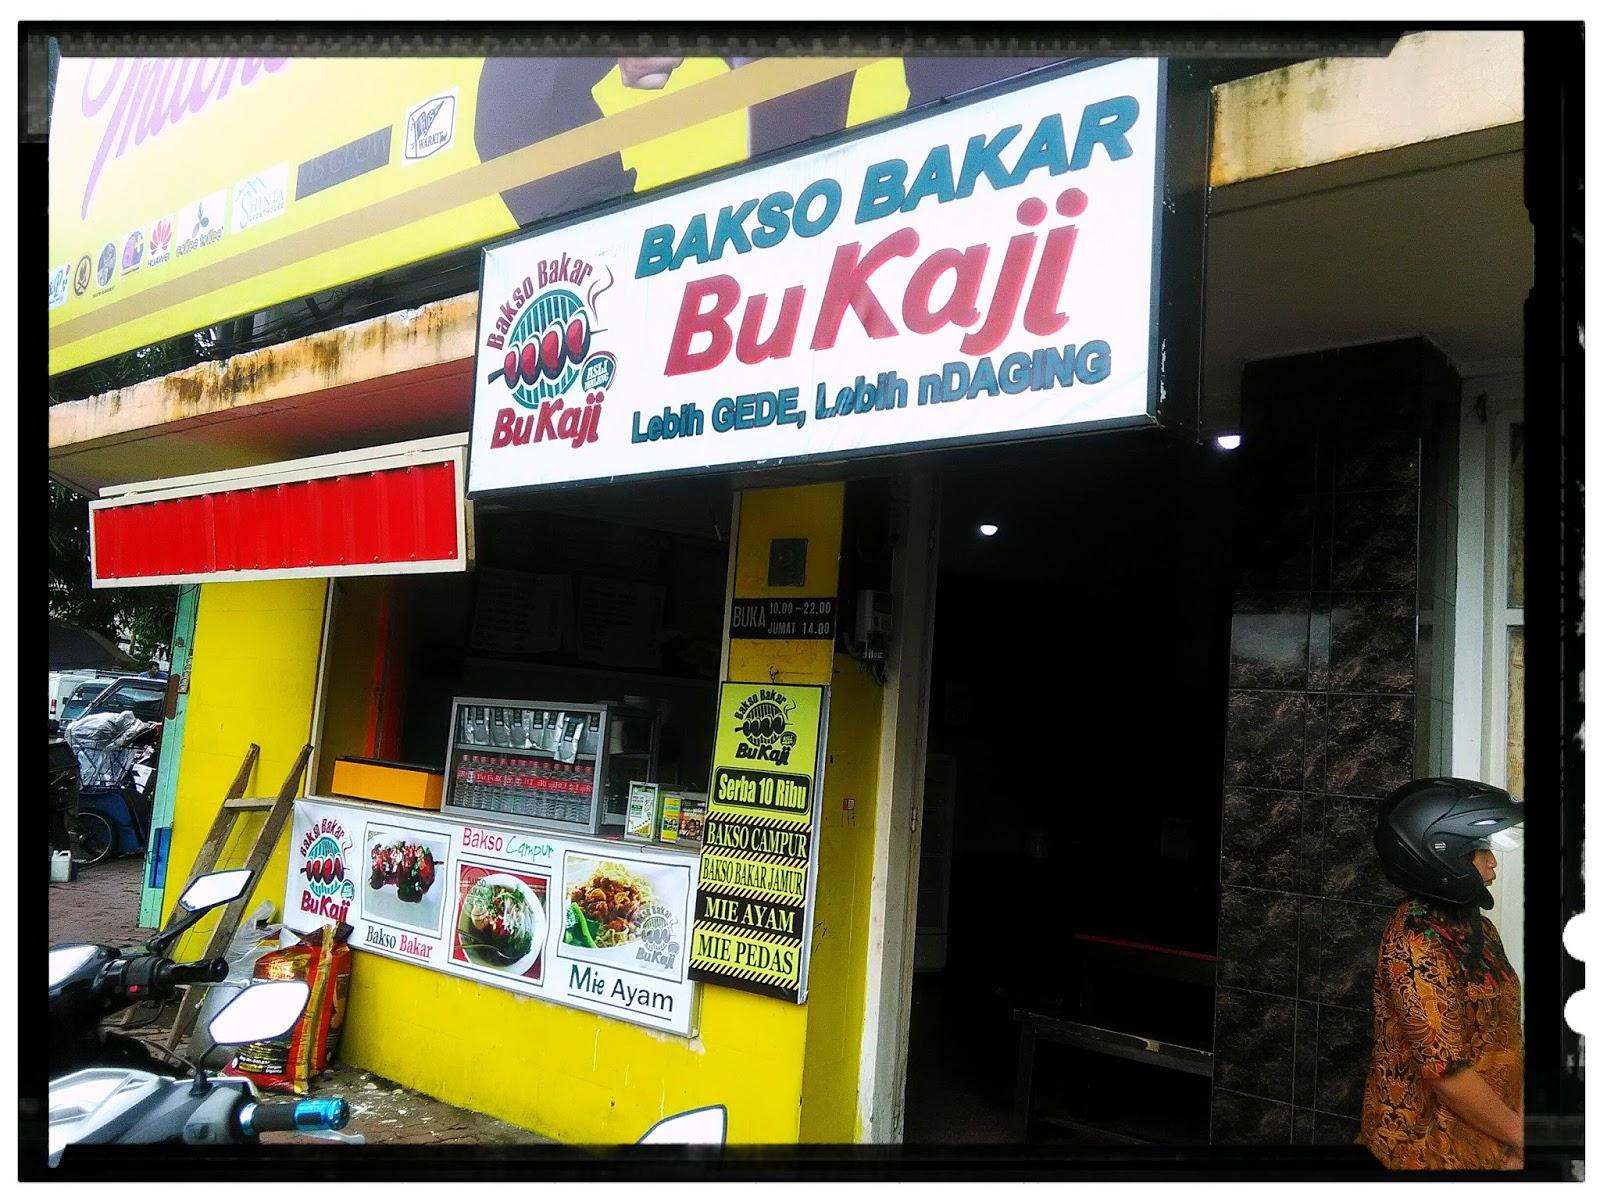 Bakso Bakar Bu Kaji Legenda Daging Sapi Kota Malang Malang Local Guides